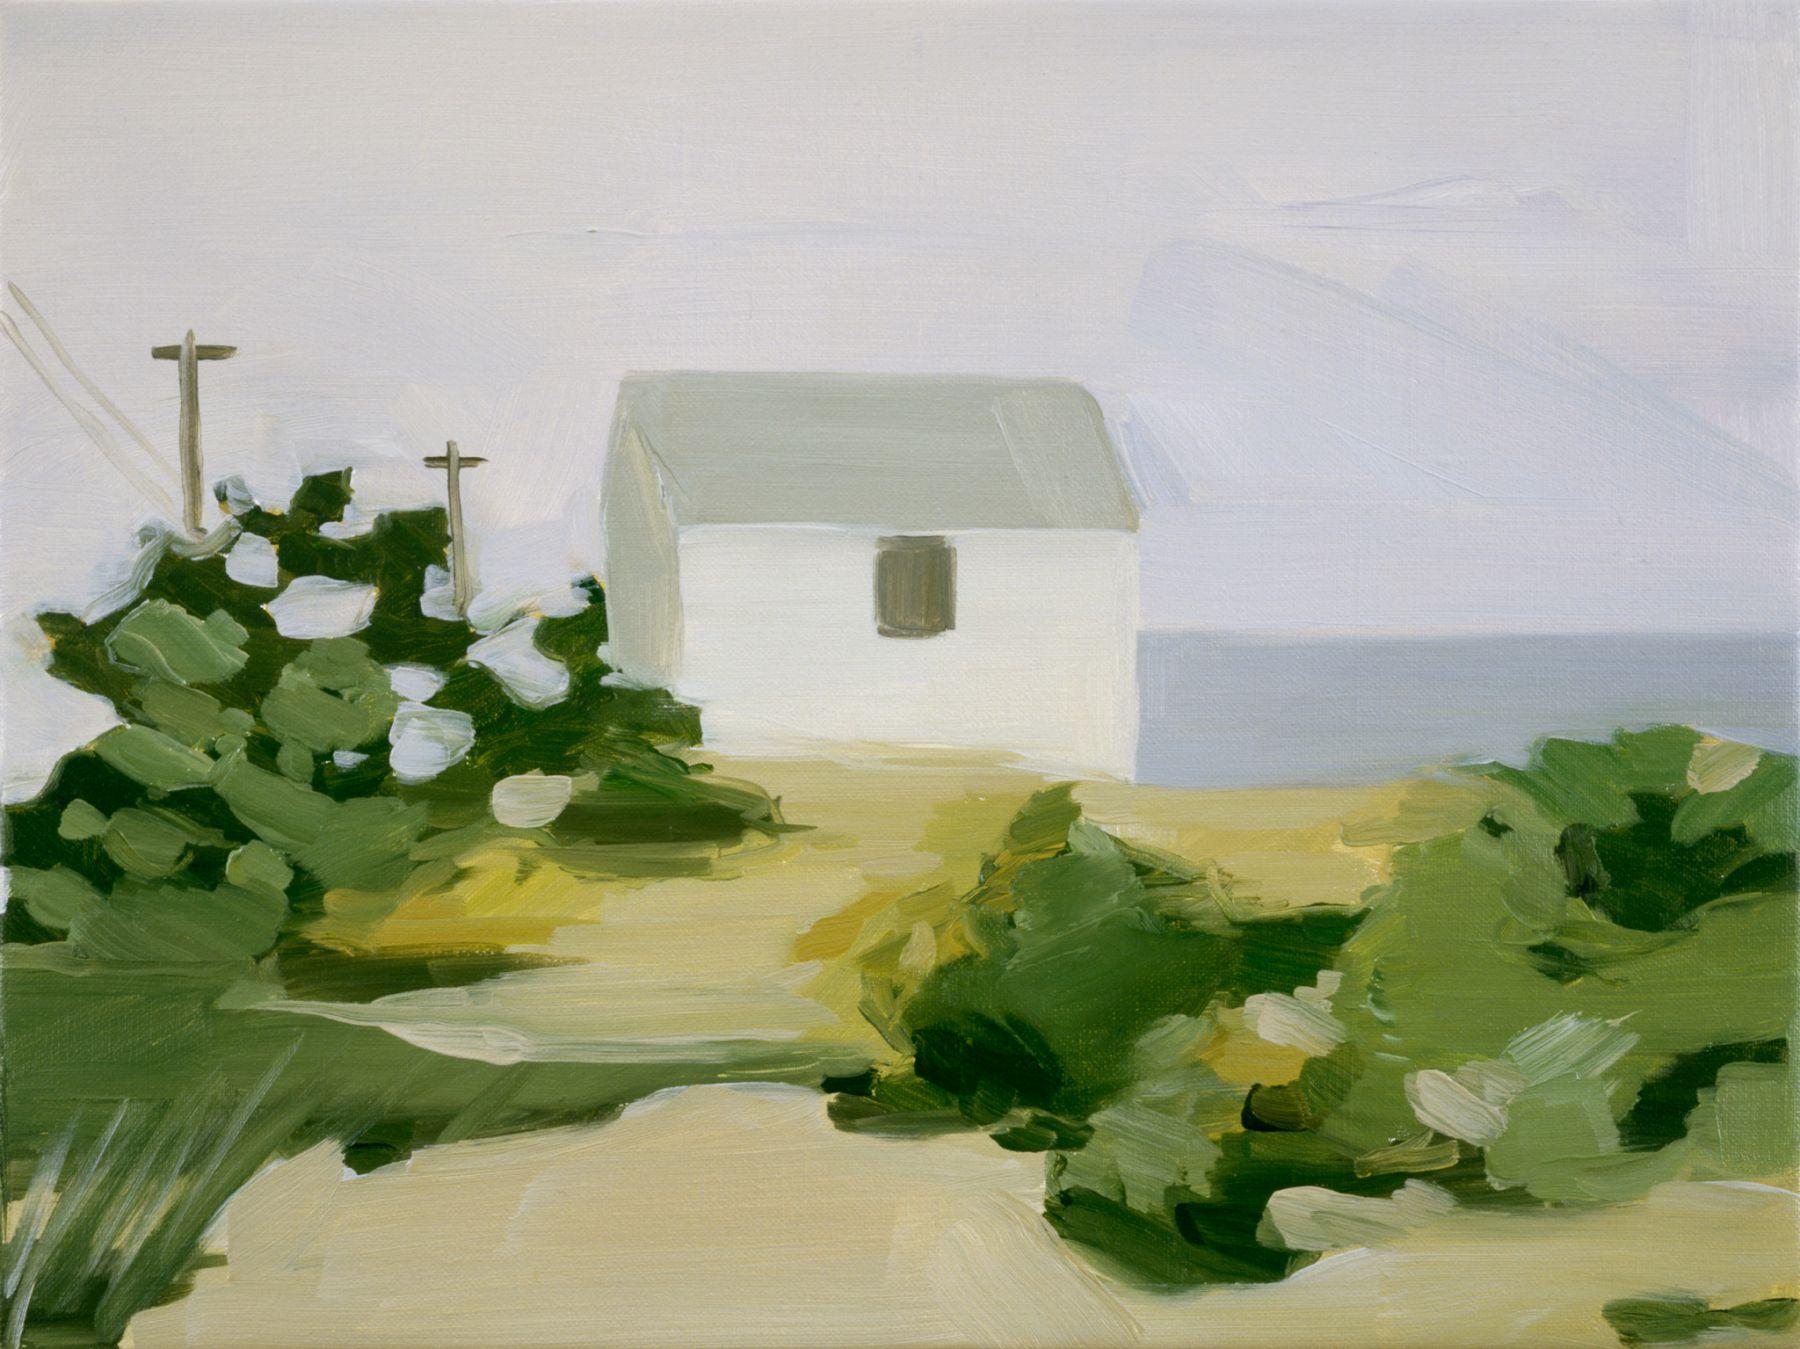 Maureen Gallace, Grassy Beach House, Falmouth, Ma., 2002